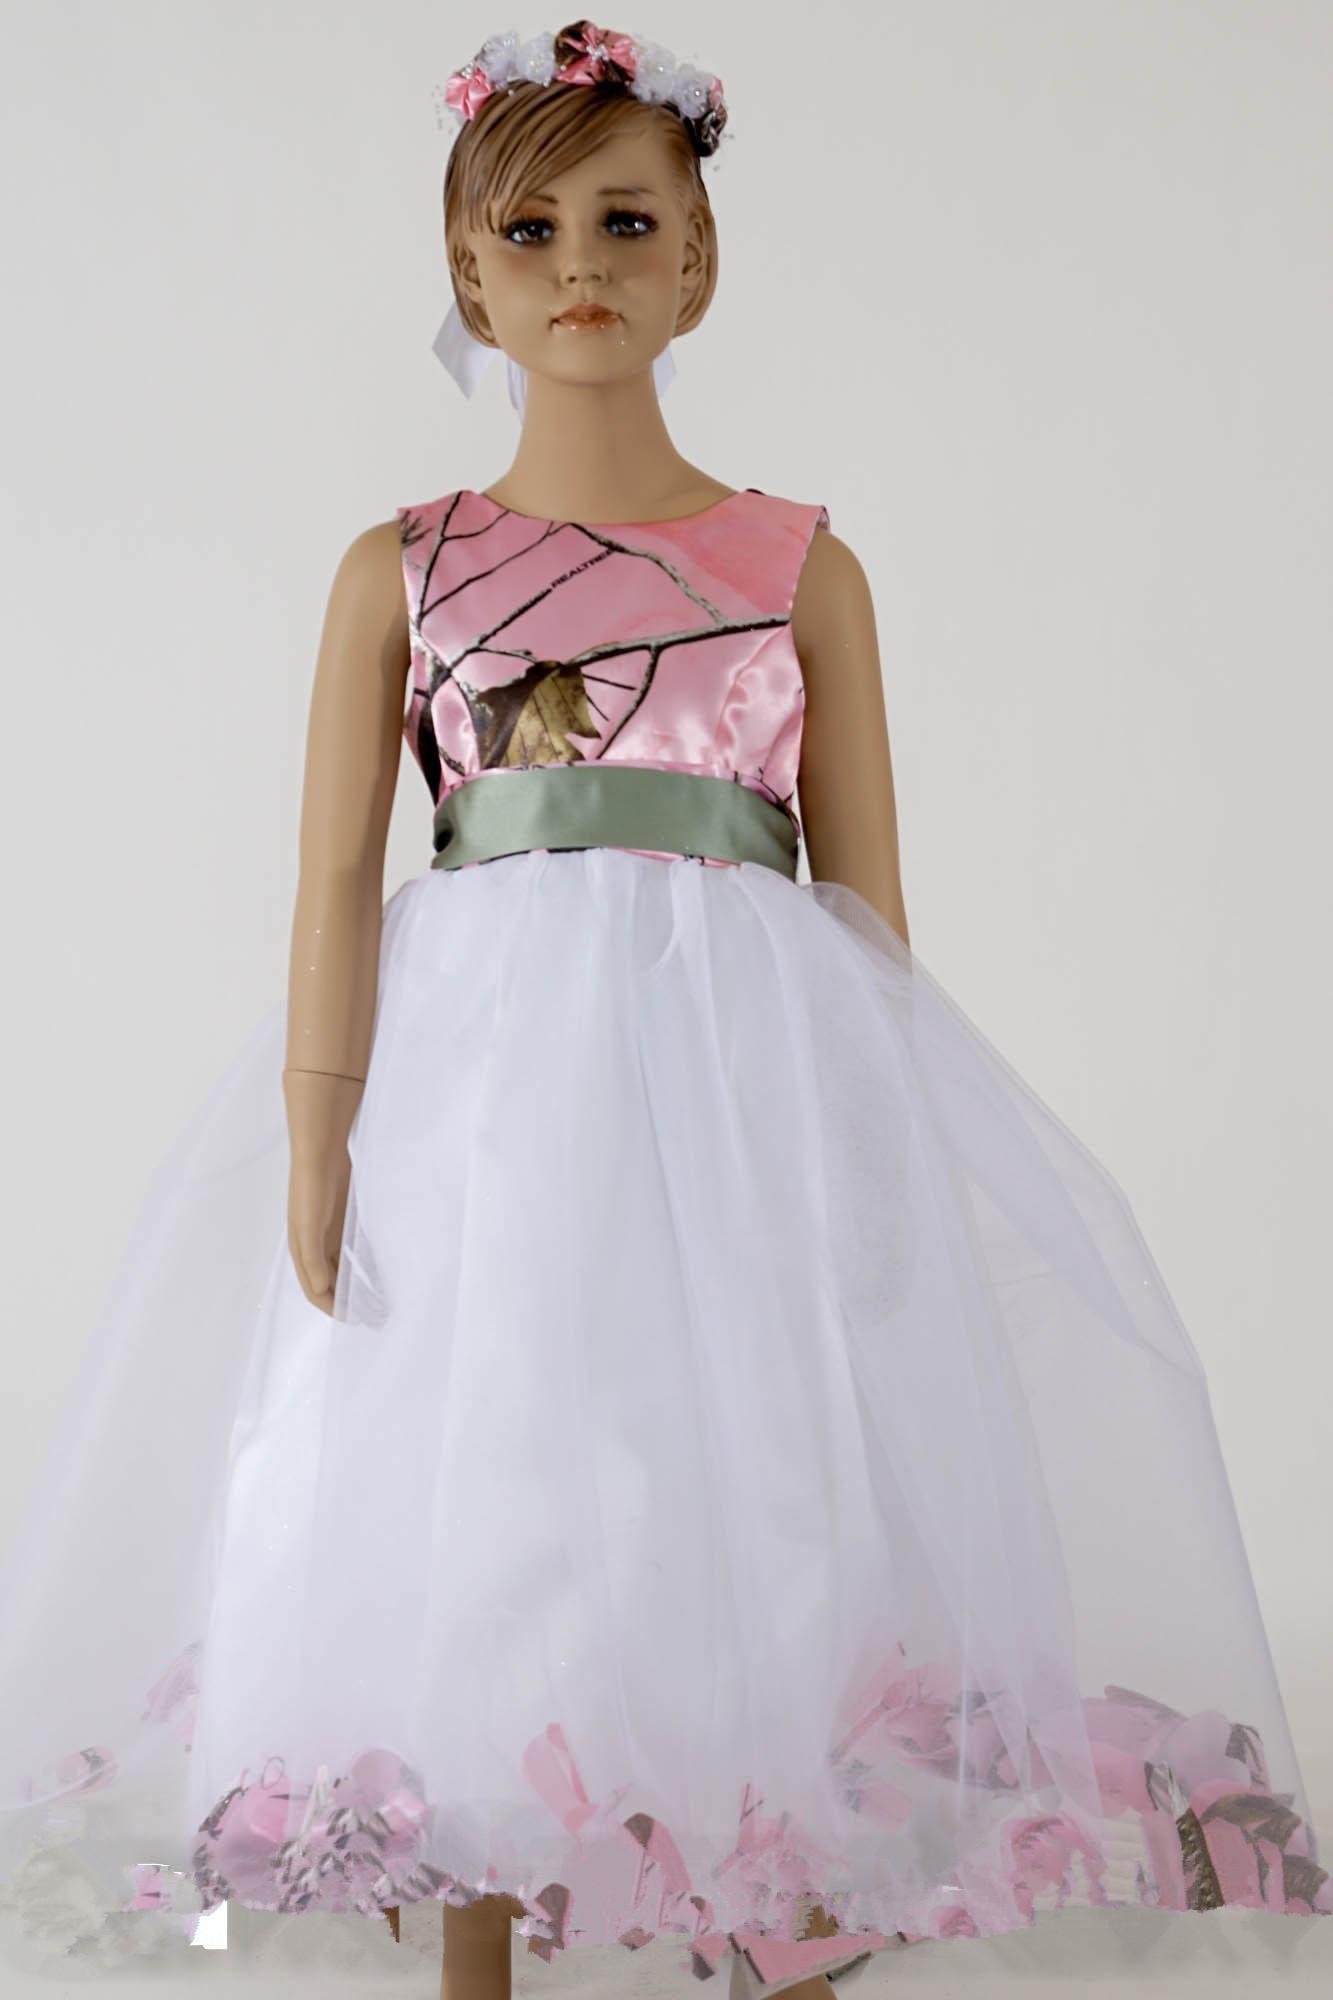 Nett Camo Abendkleider Ideen - Brautkleider Ideen - cashingy.info